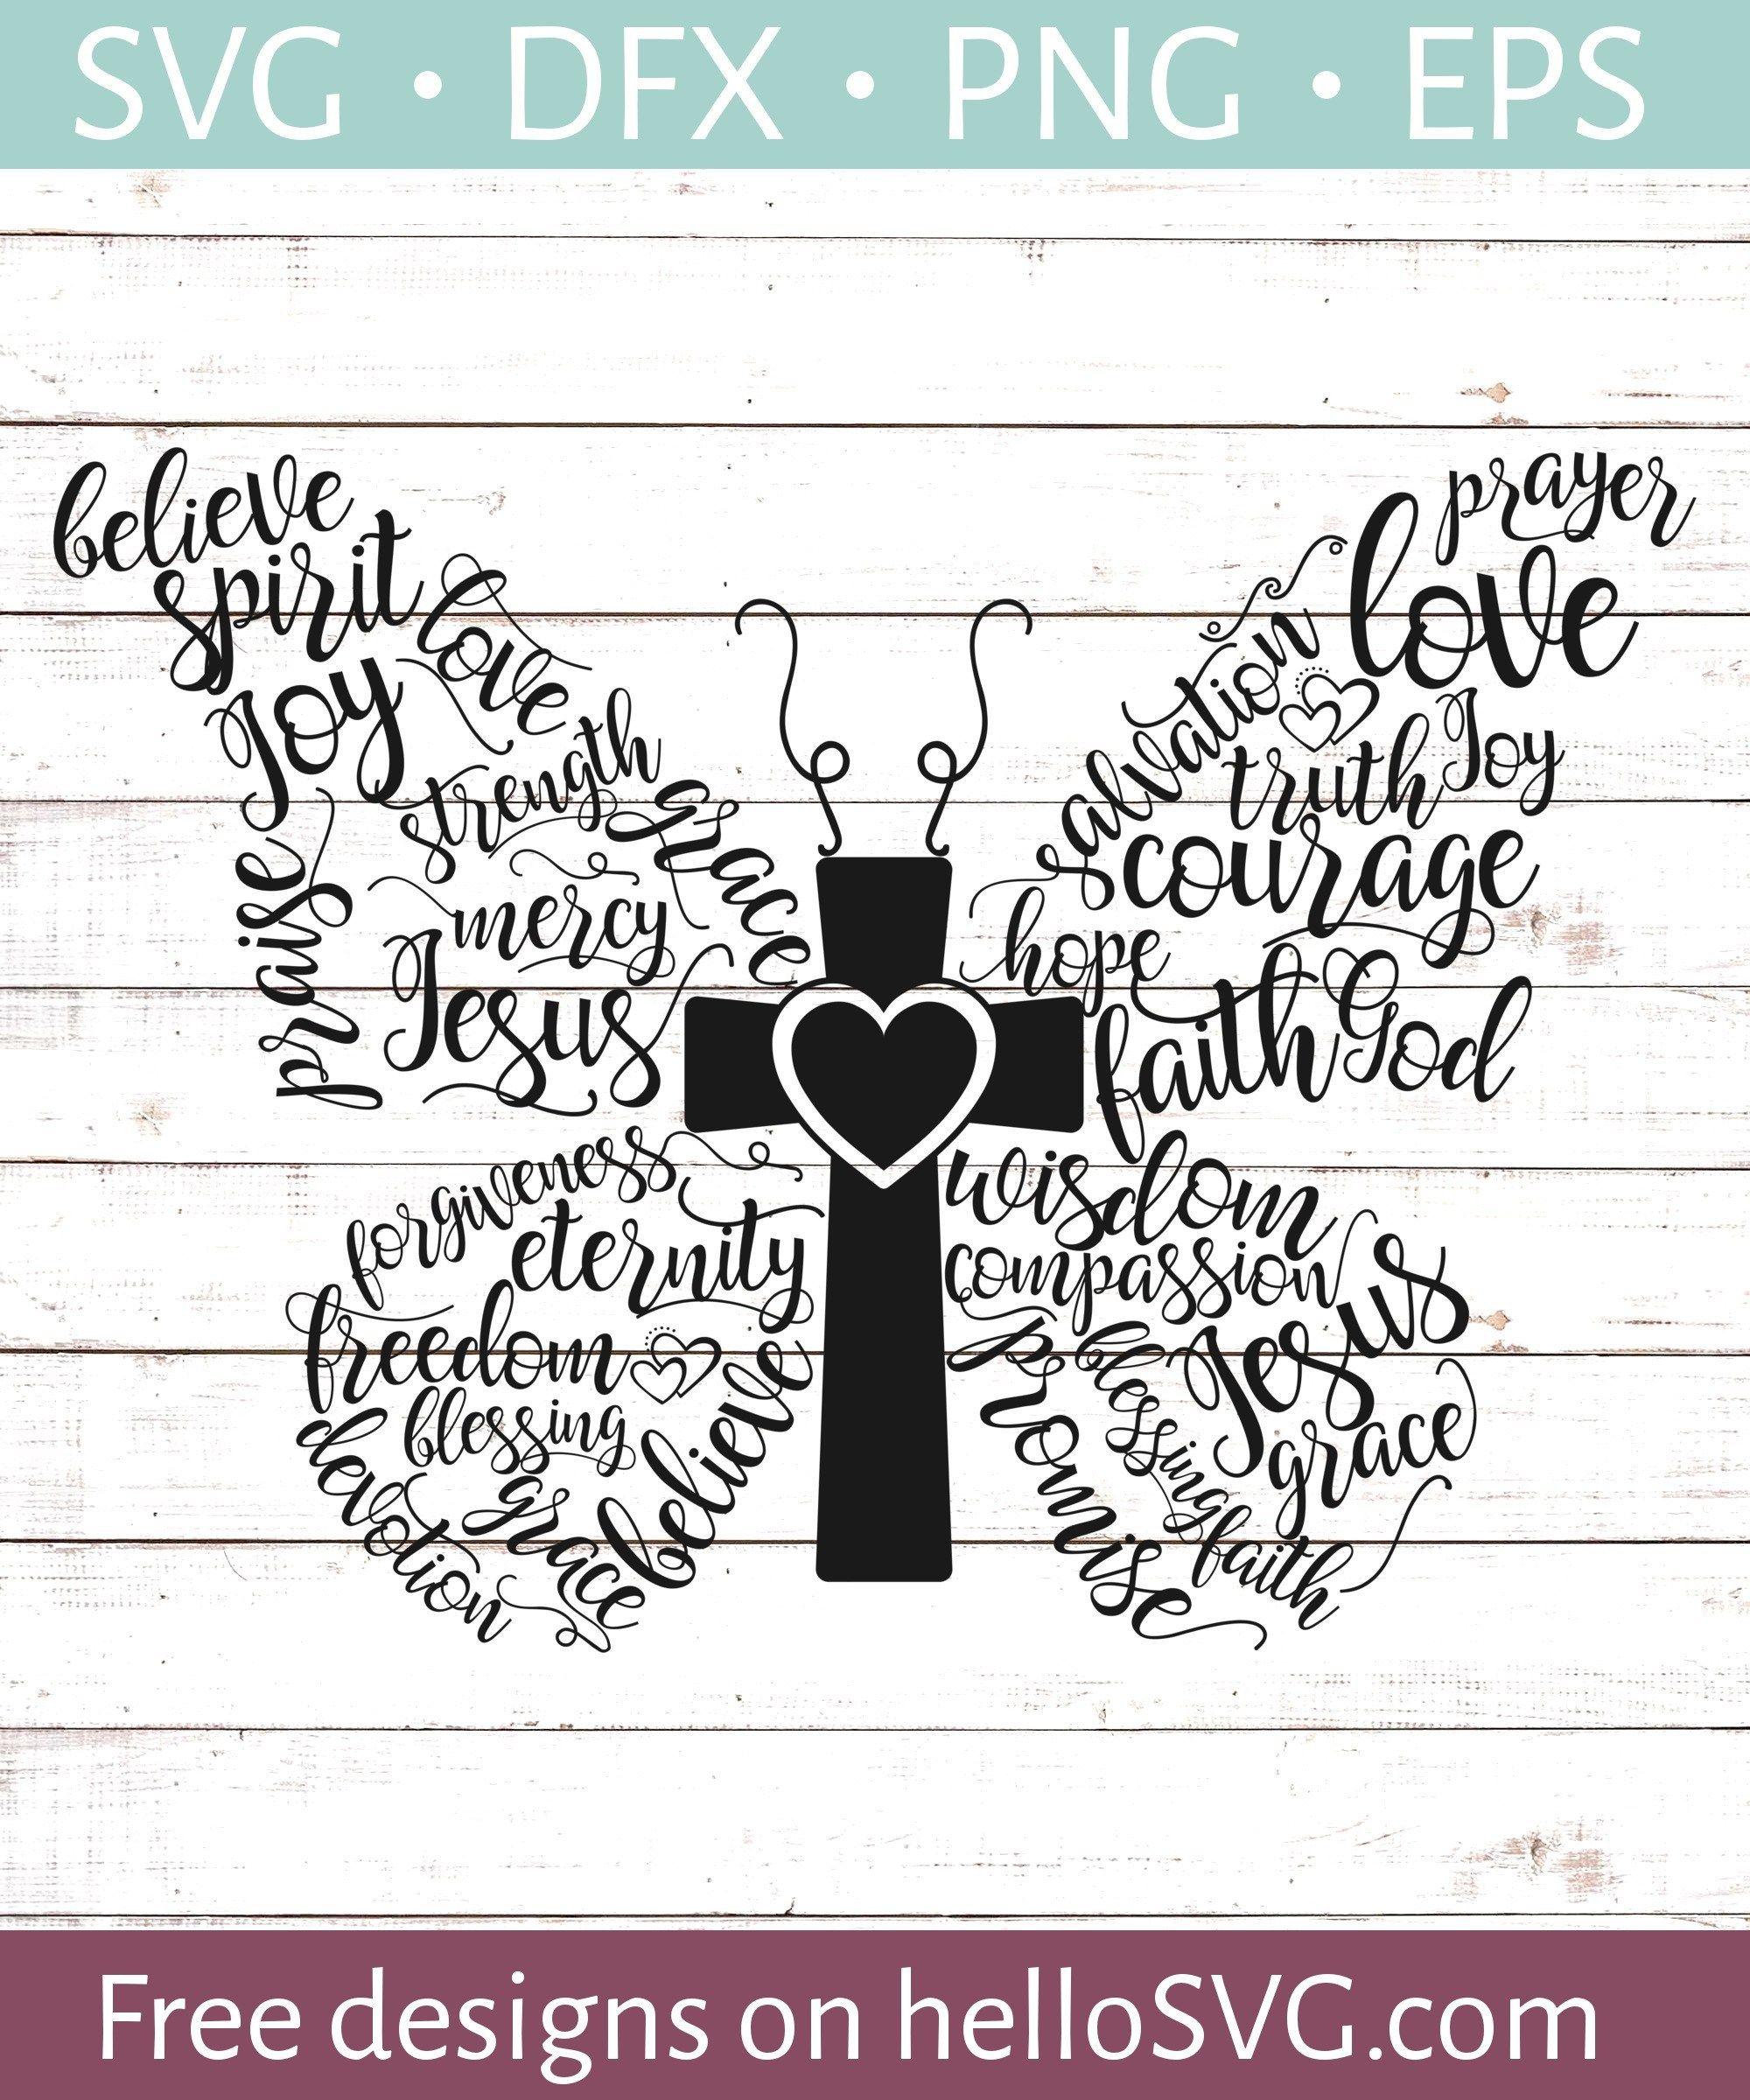 Christian Butterfly Svg Free Svg Files Hellosvg Com Butterflies Svg Svg Files For Cricut Svg Free Files